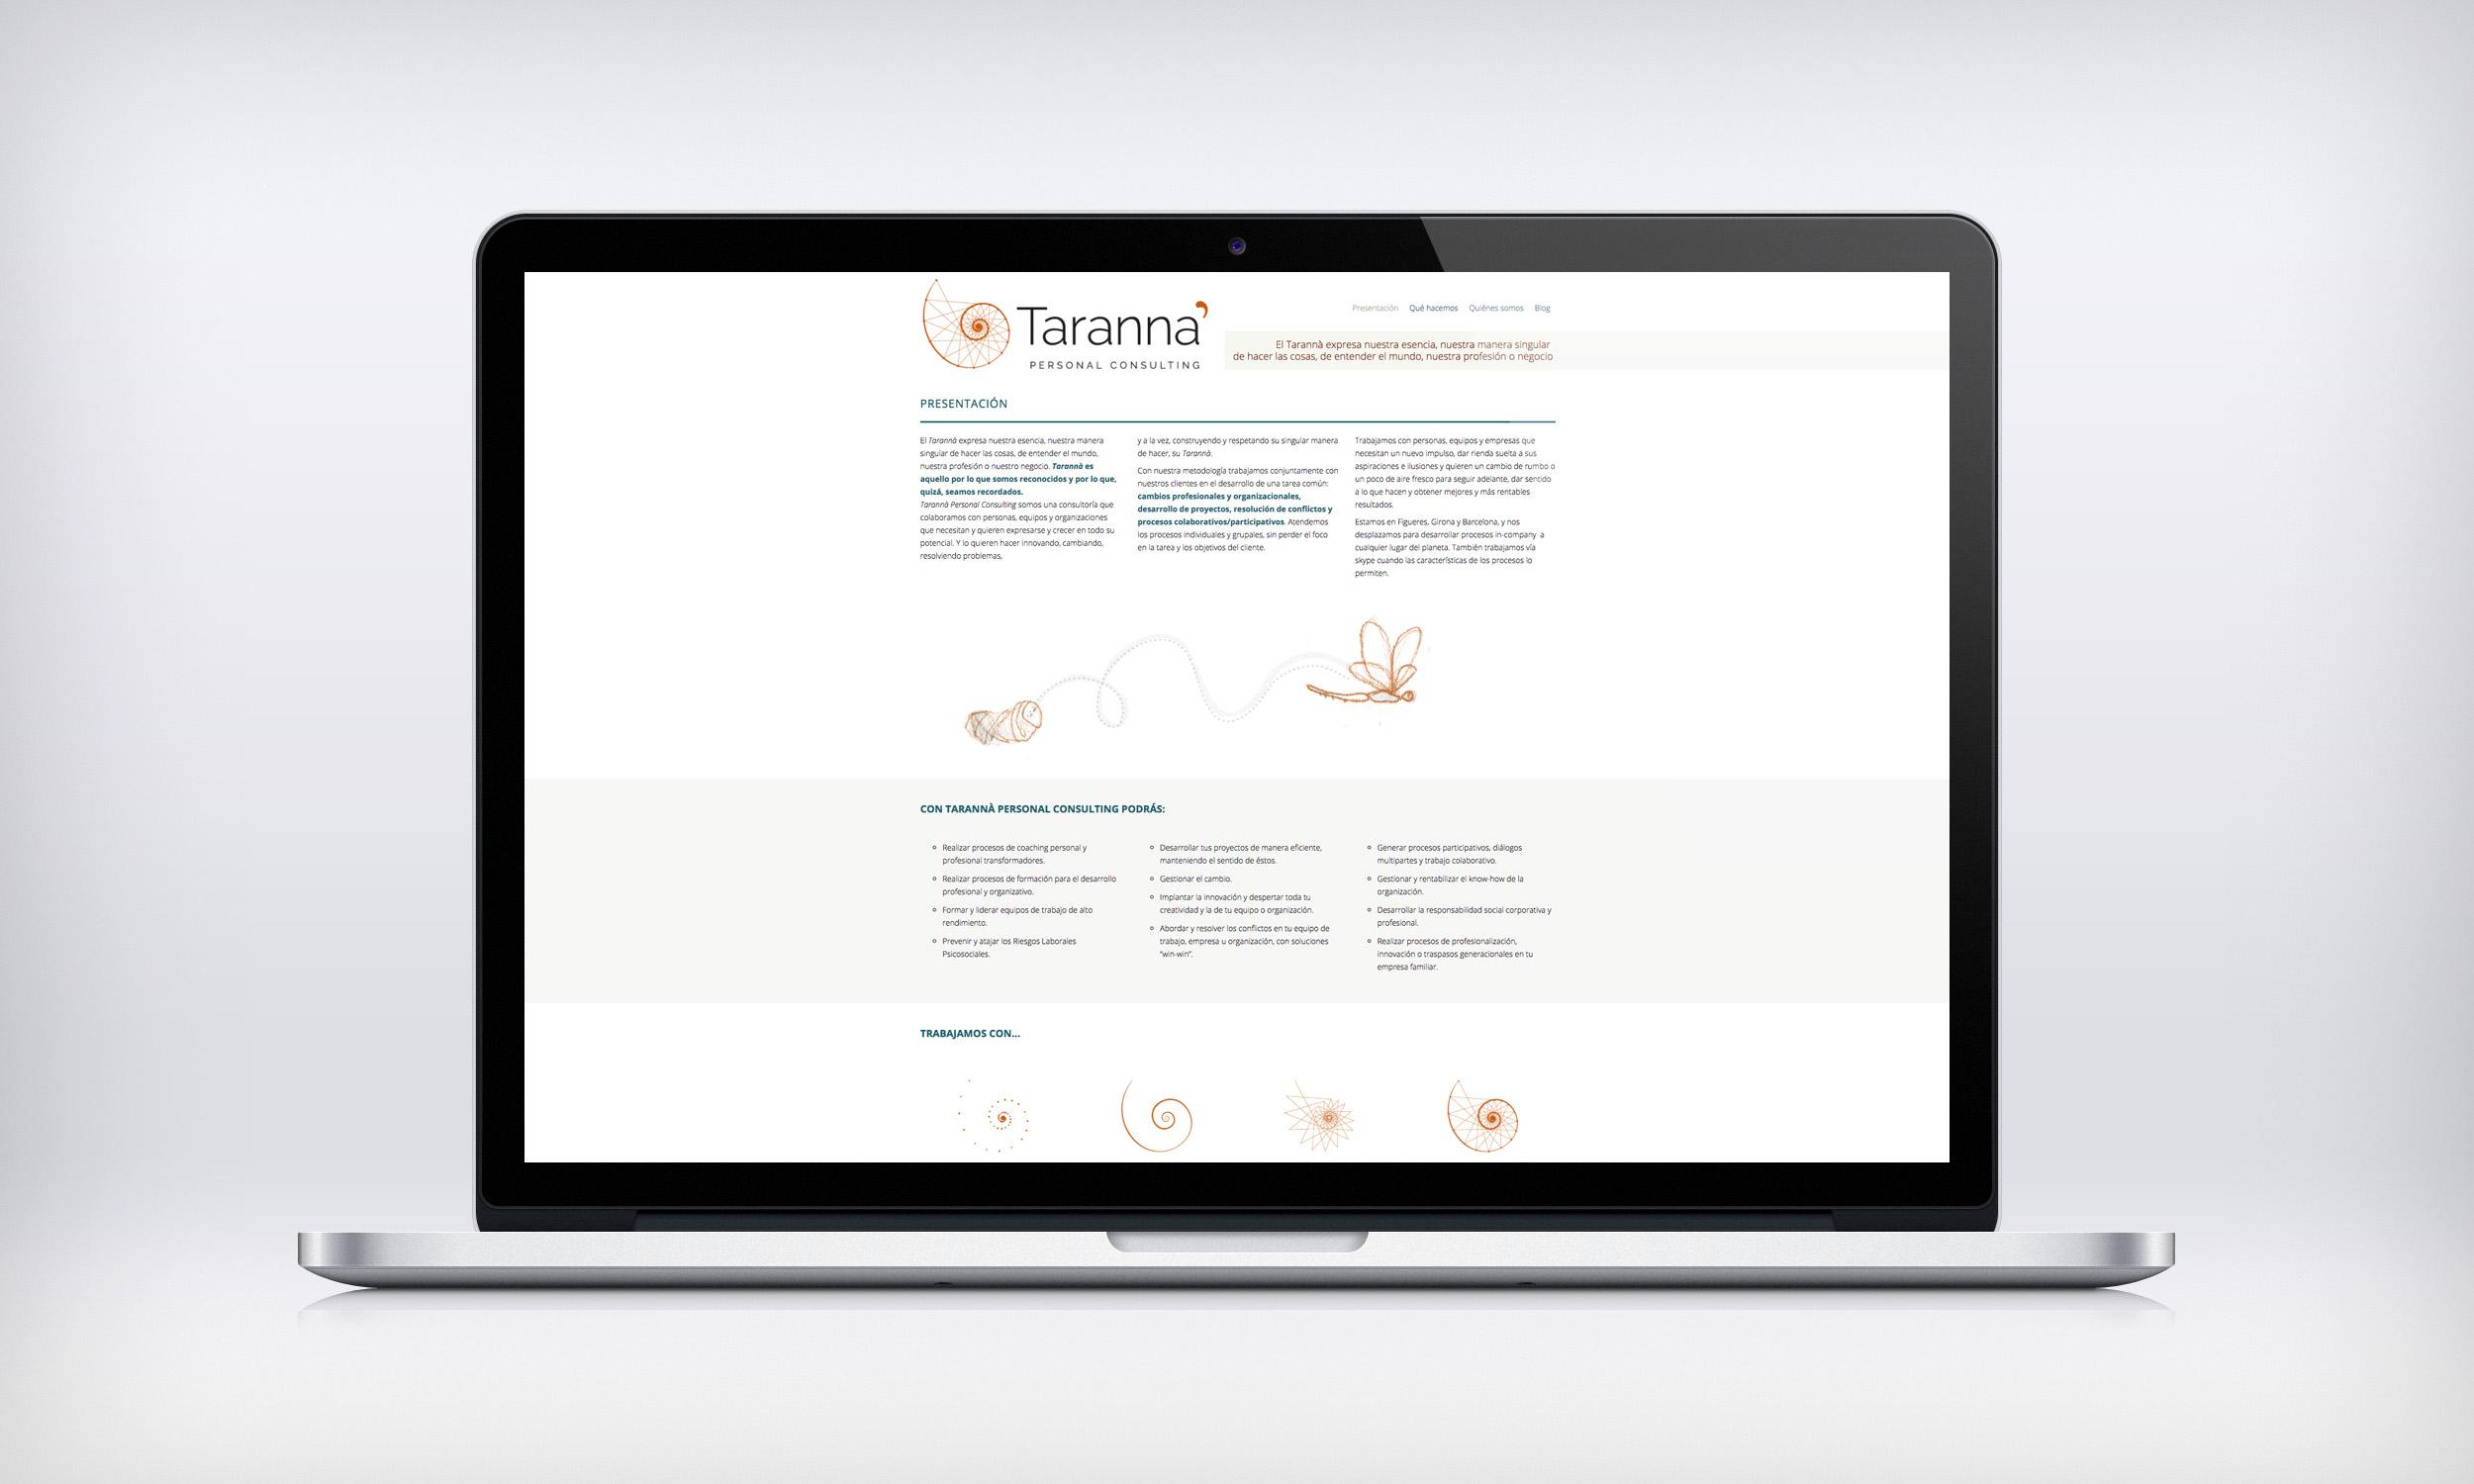 Taranna_MacBook_Pro_02.jpg